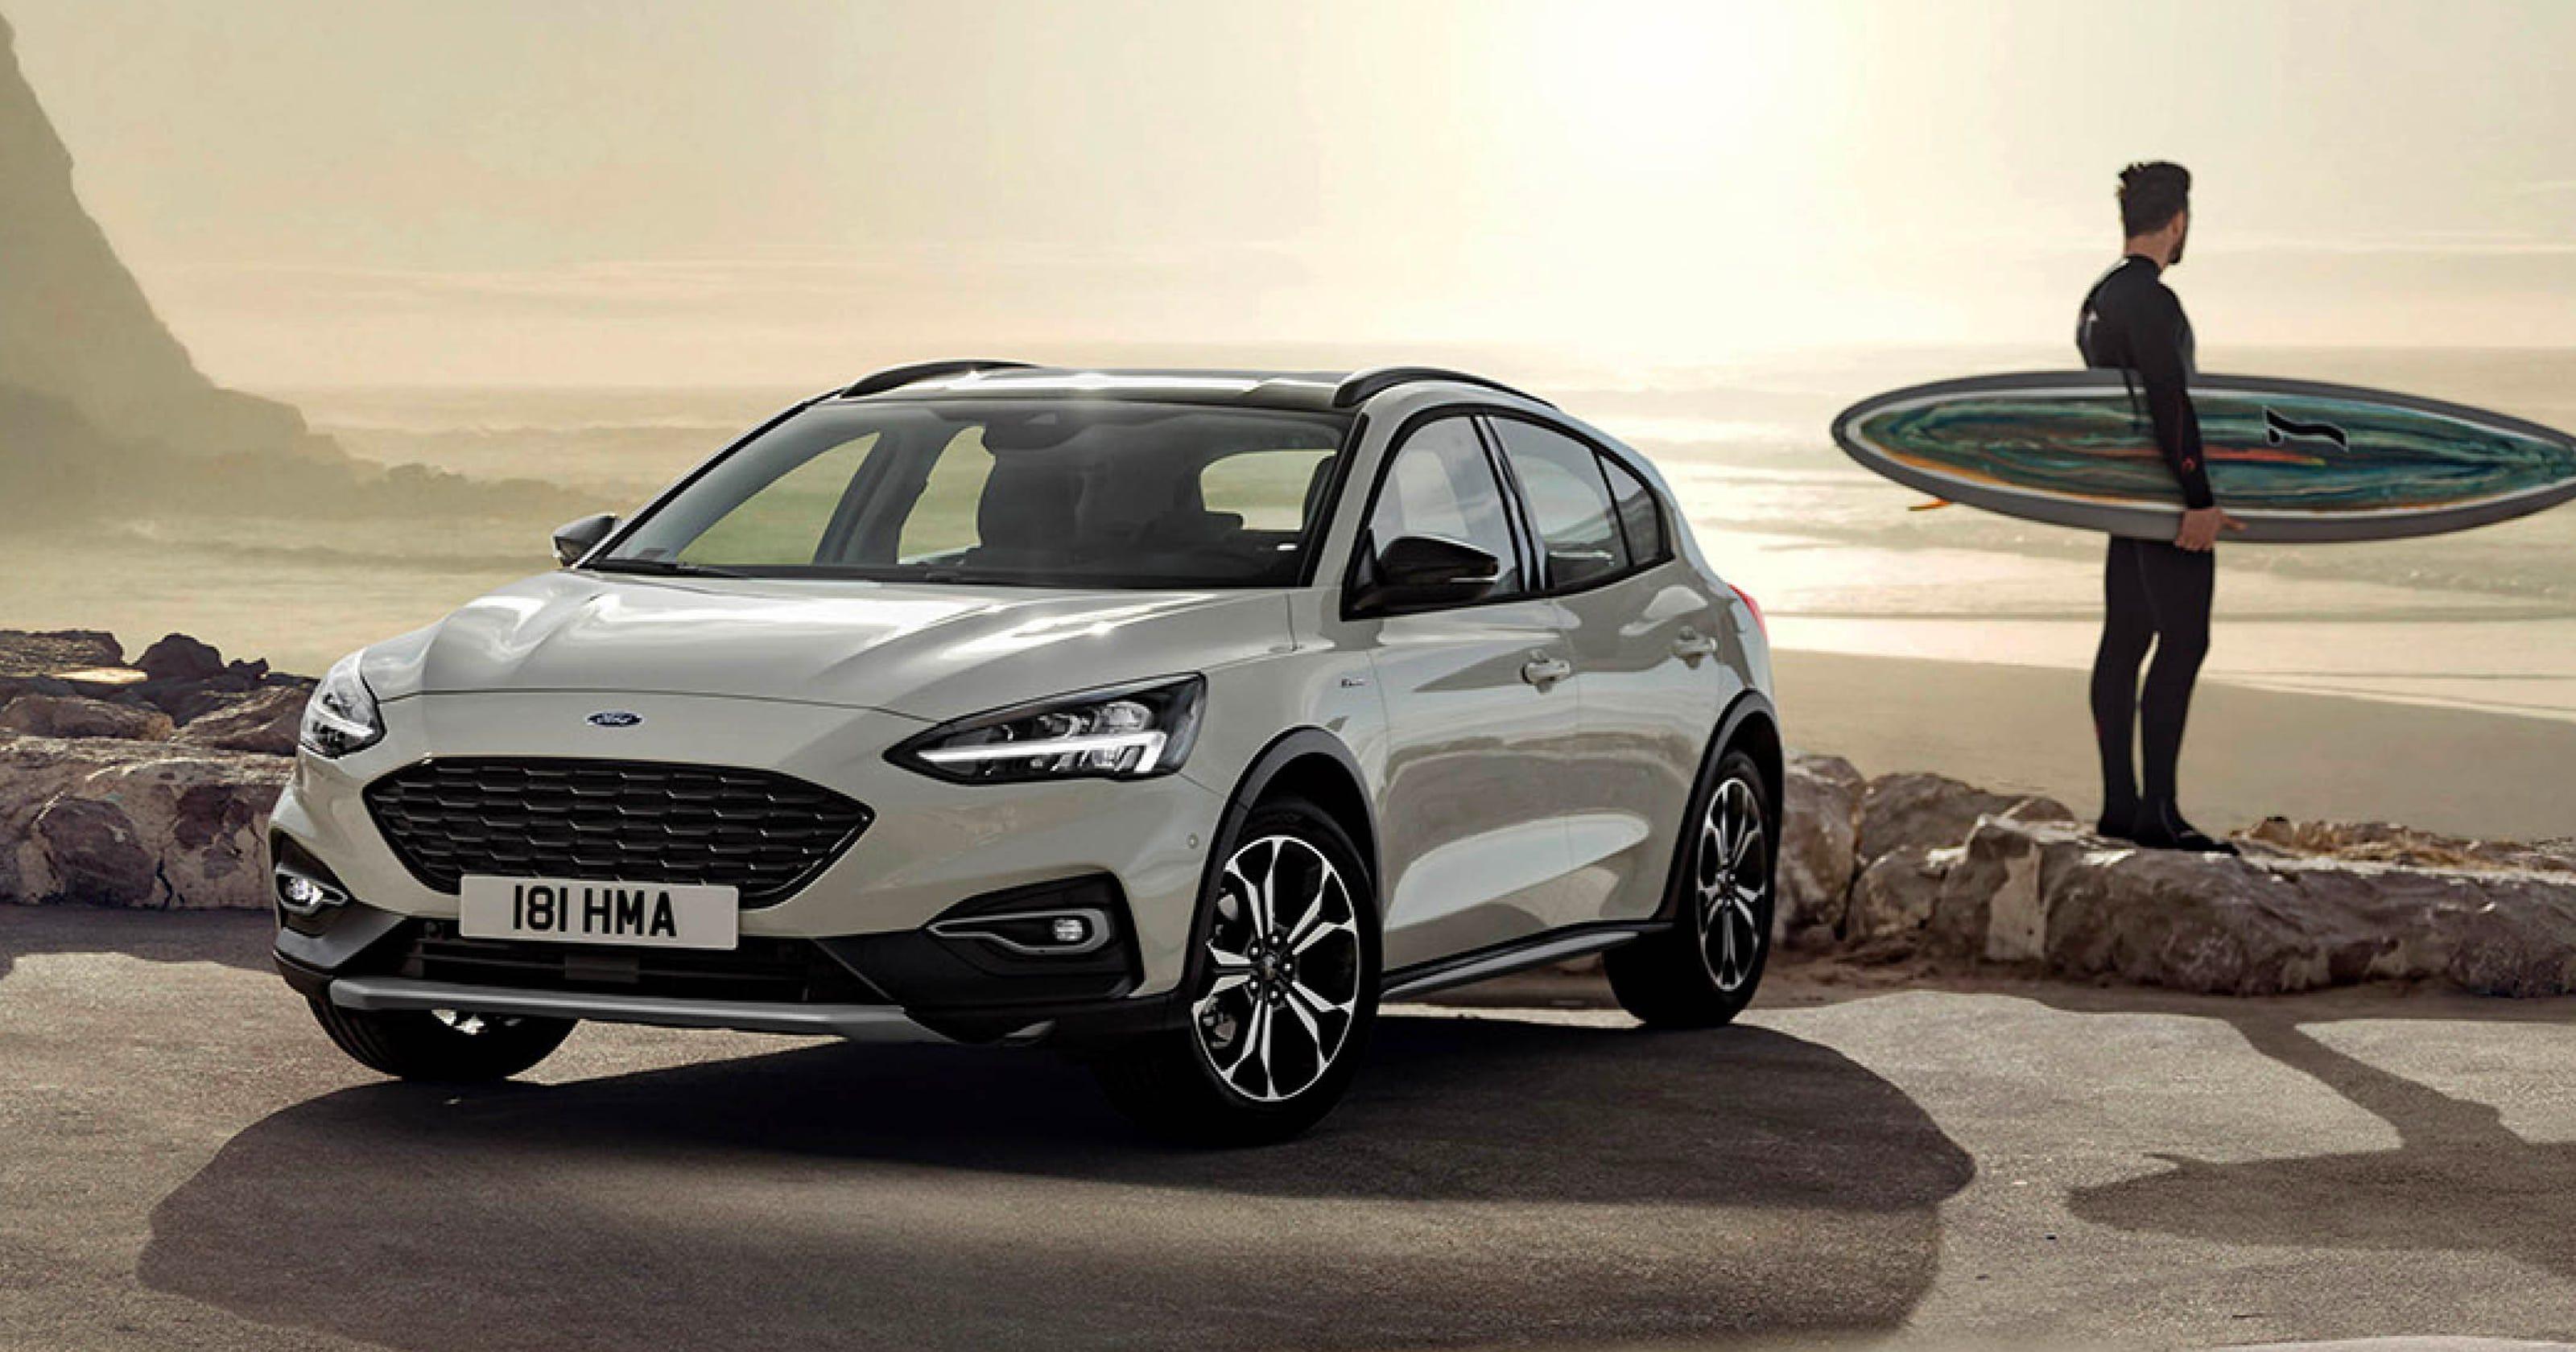 Ford Focus For 2019 Gets Roomier More Tech Forward No Longer Made 2000 Se Sedan In Us